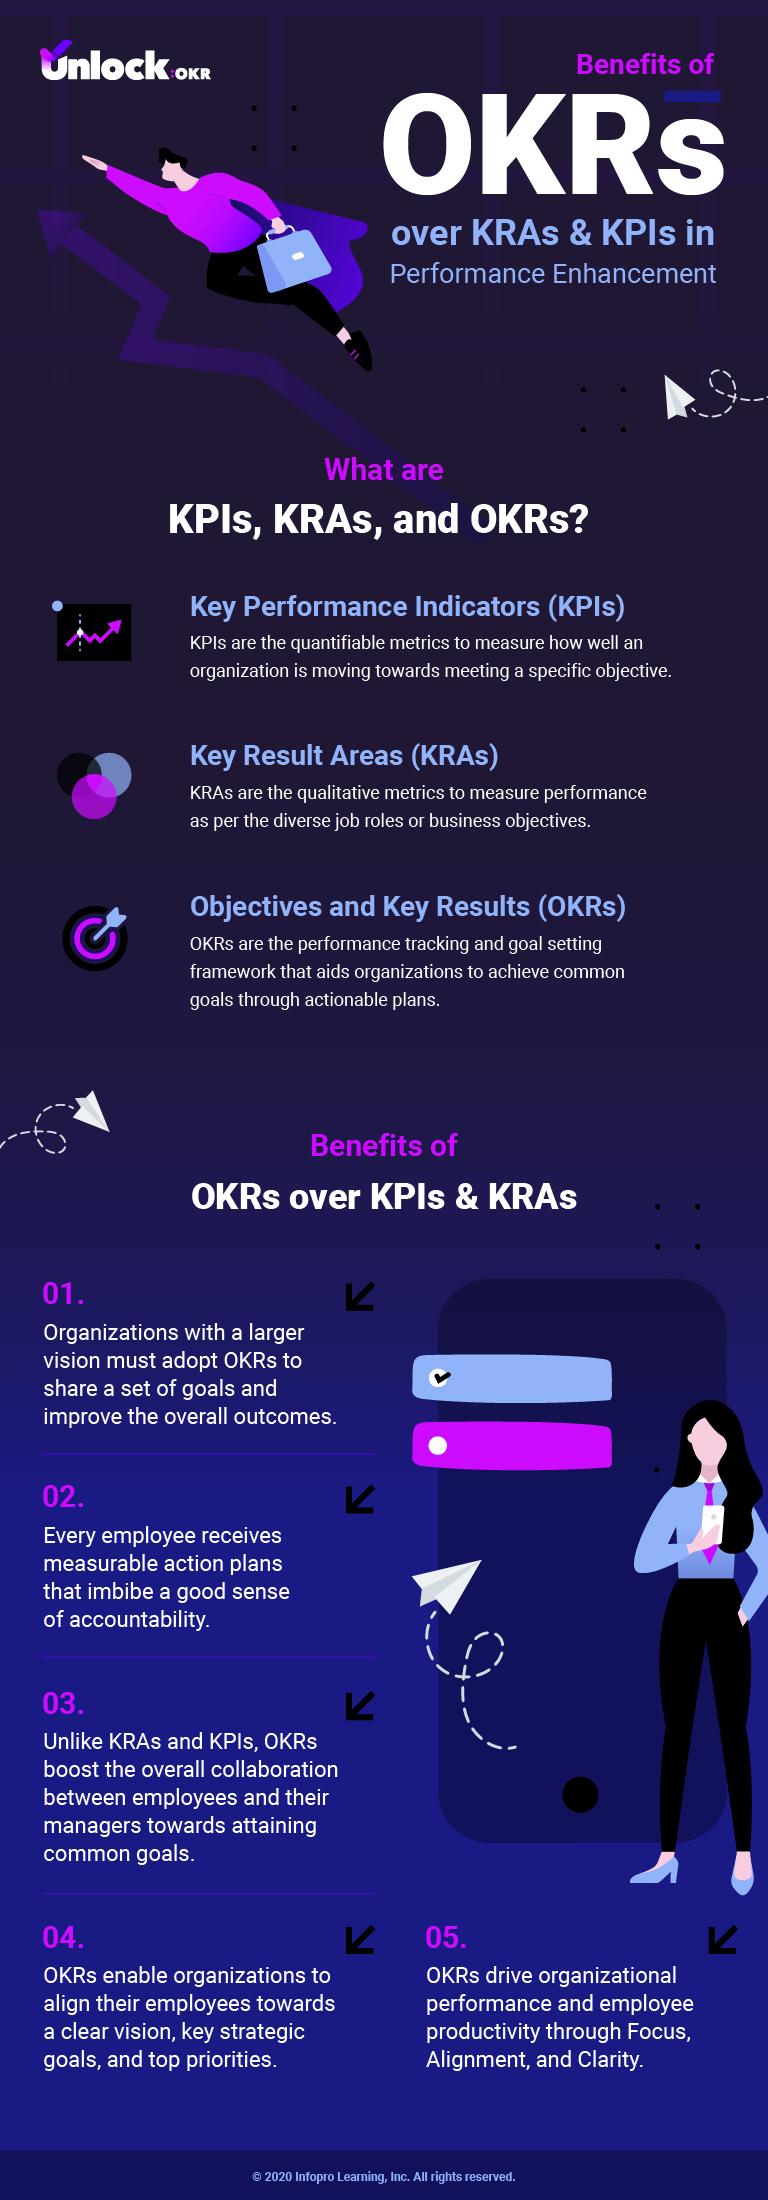 Benefits of OKRs over KRAs & KPIs in Performance Enhancemen_1